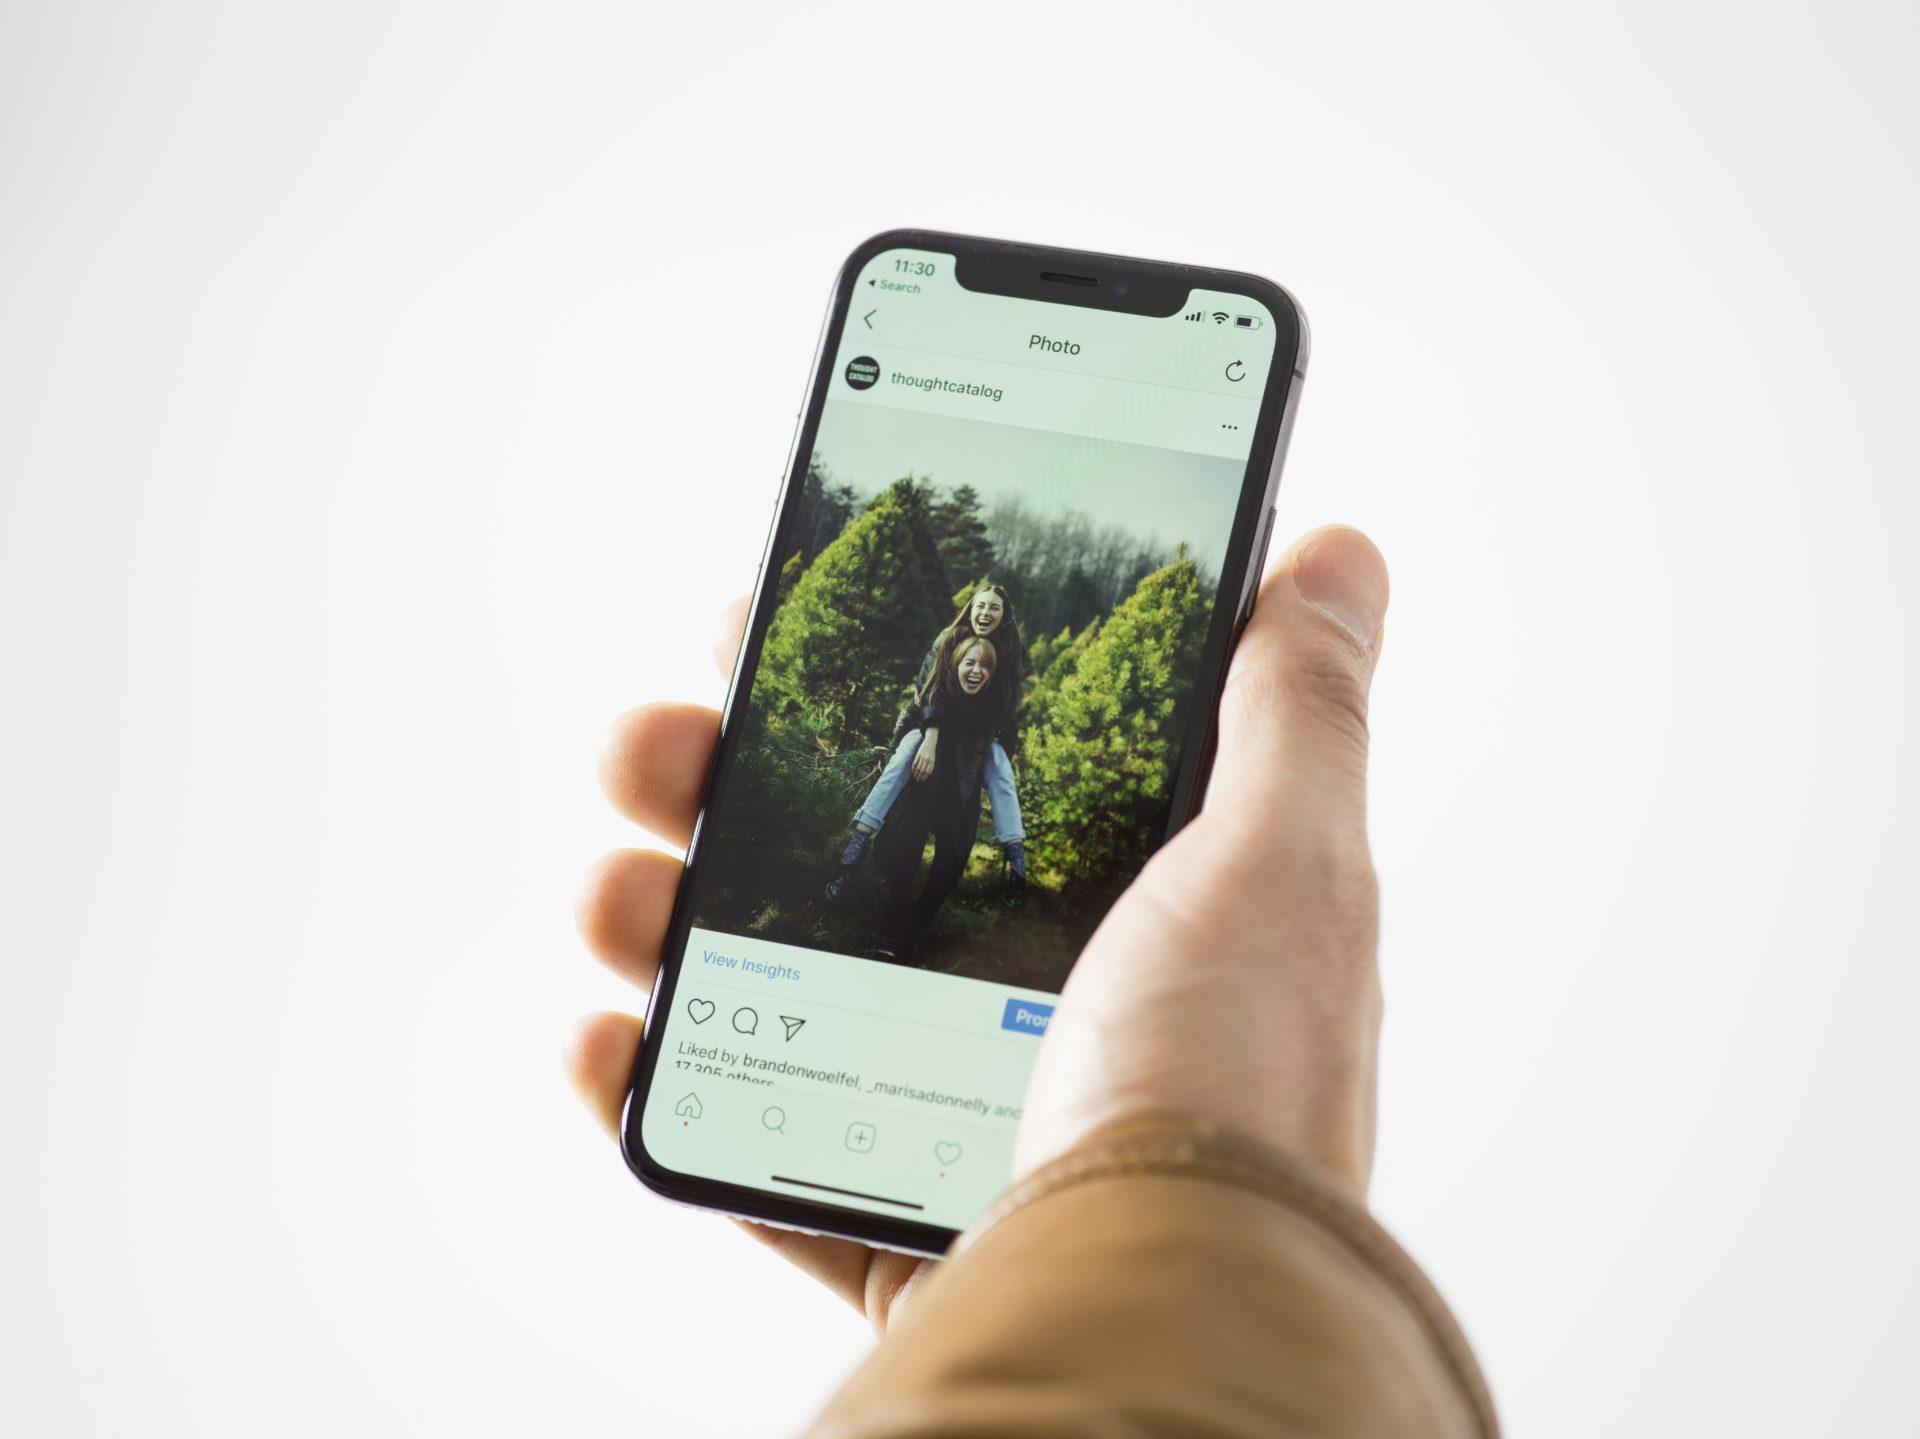 Instagram App Open on Cell Phone